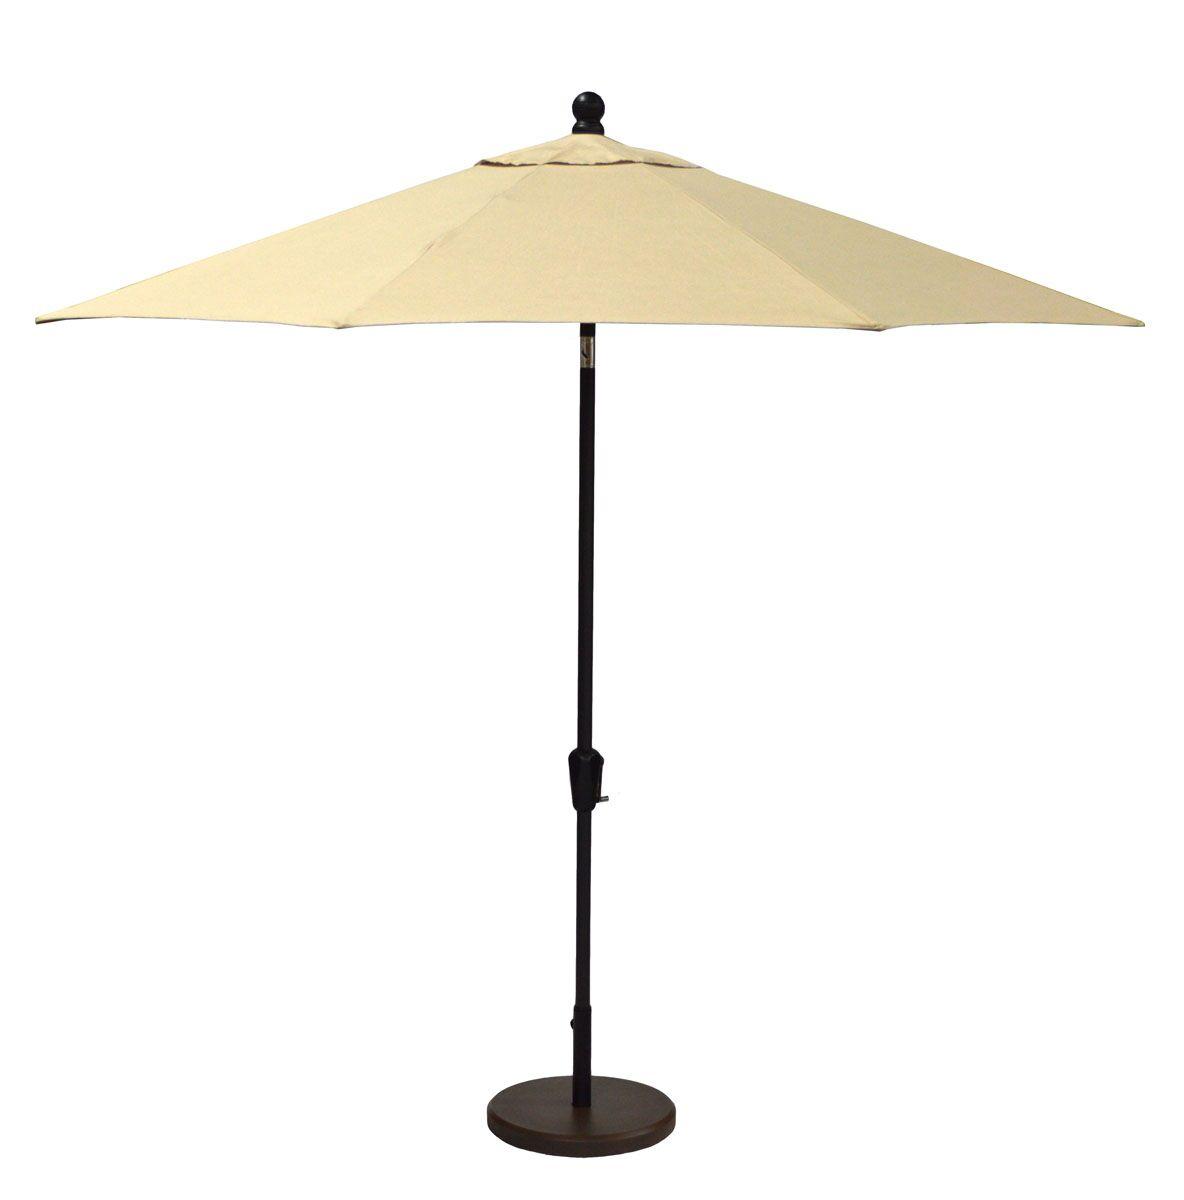 Sunbrella 11' Market Umbrella Fabric: Spectrum Sand, Frame Finish: Black